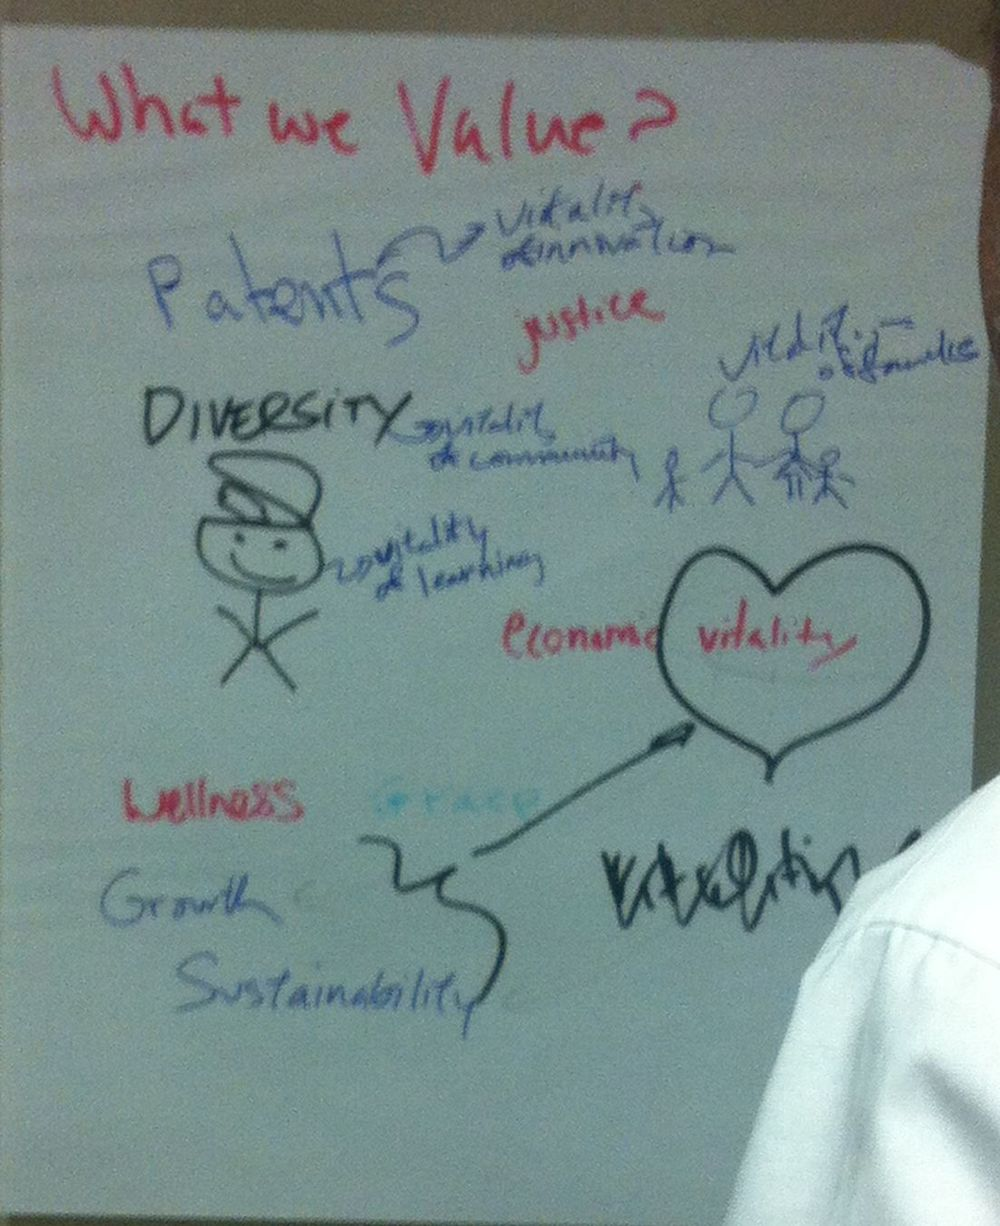 Strategic Planning Poster on Values